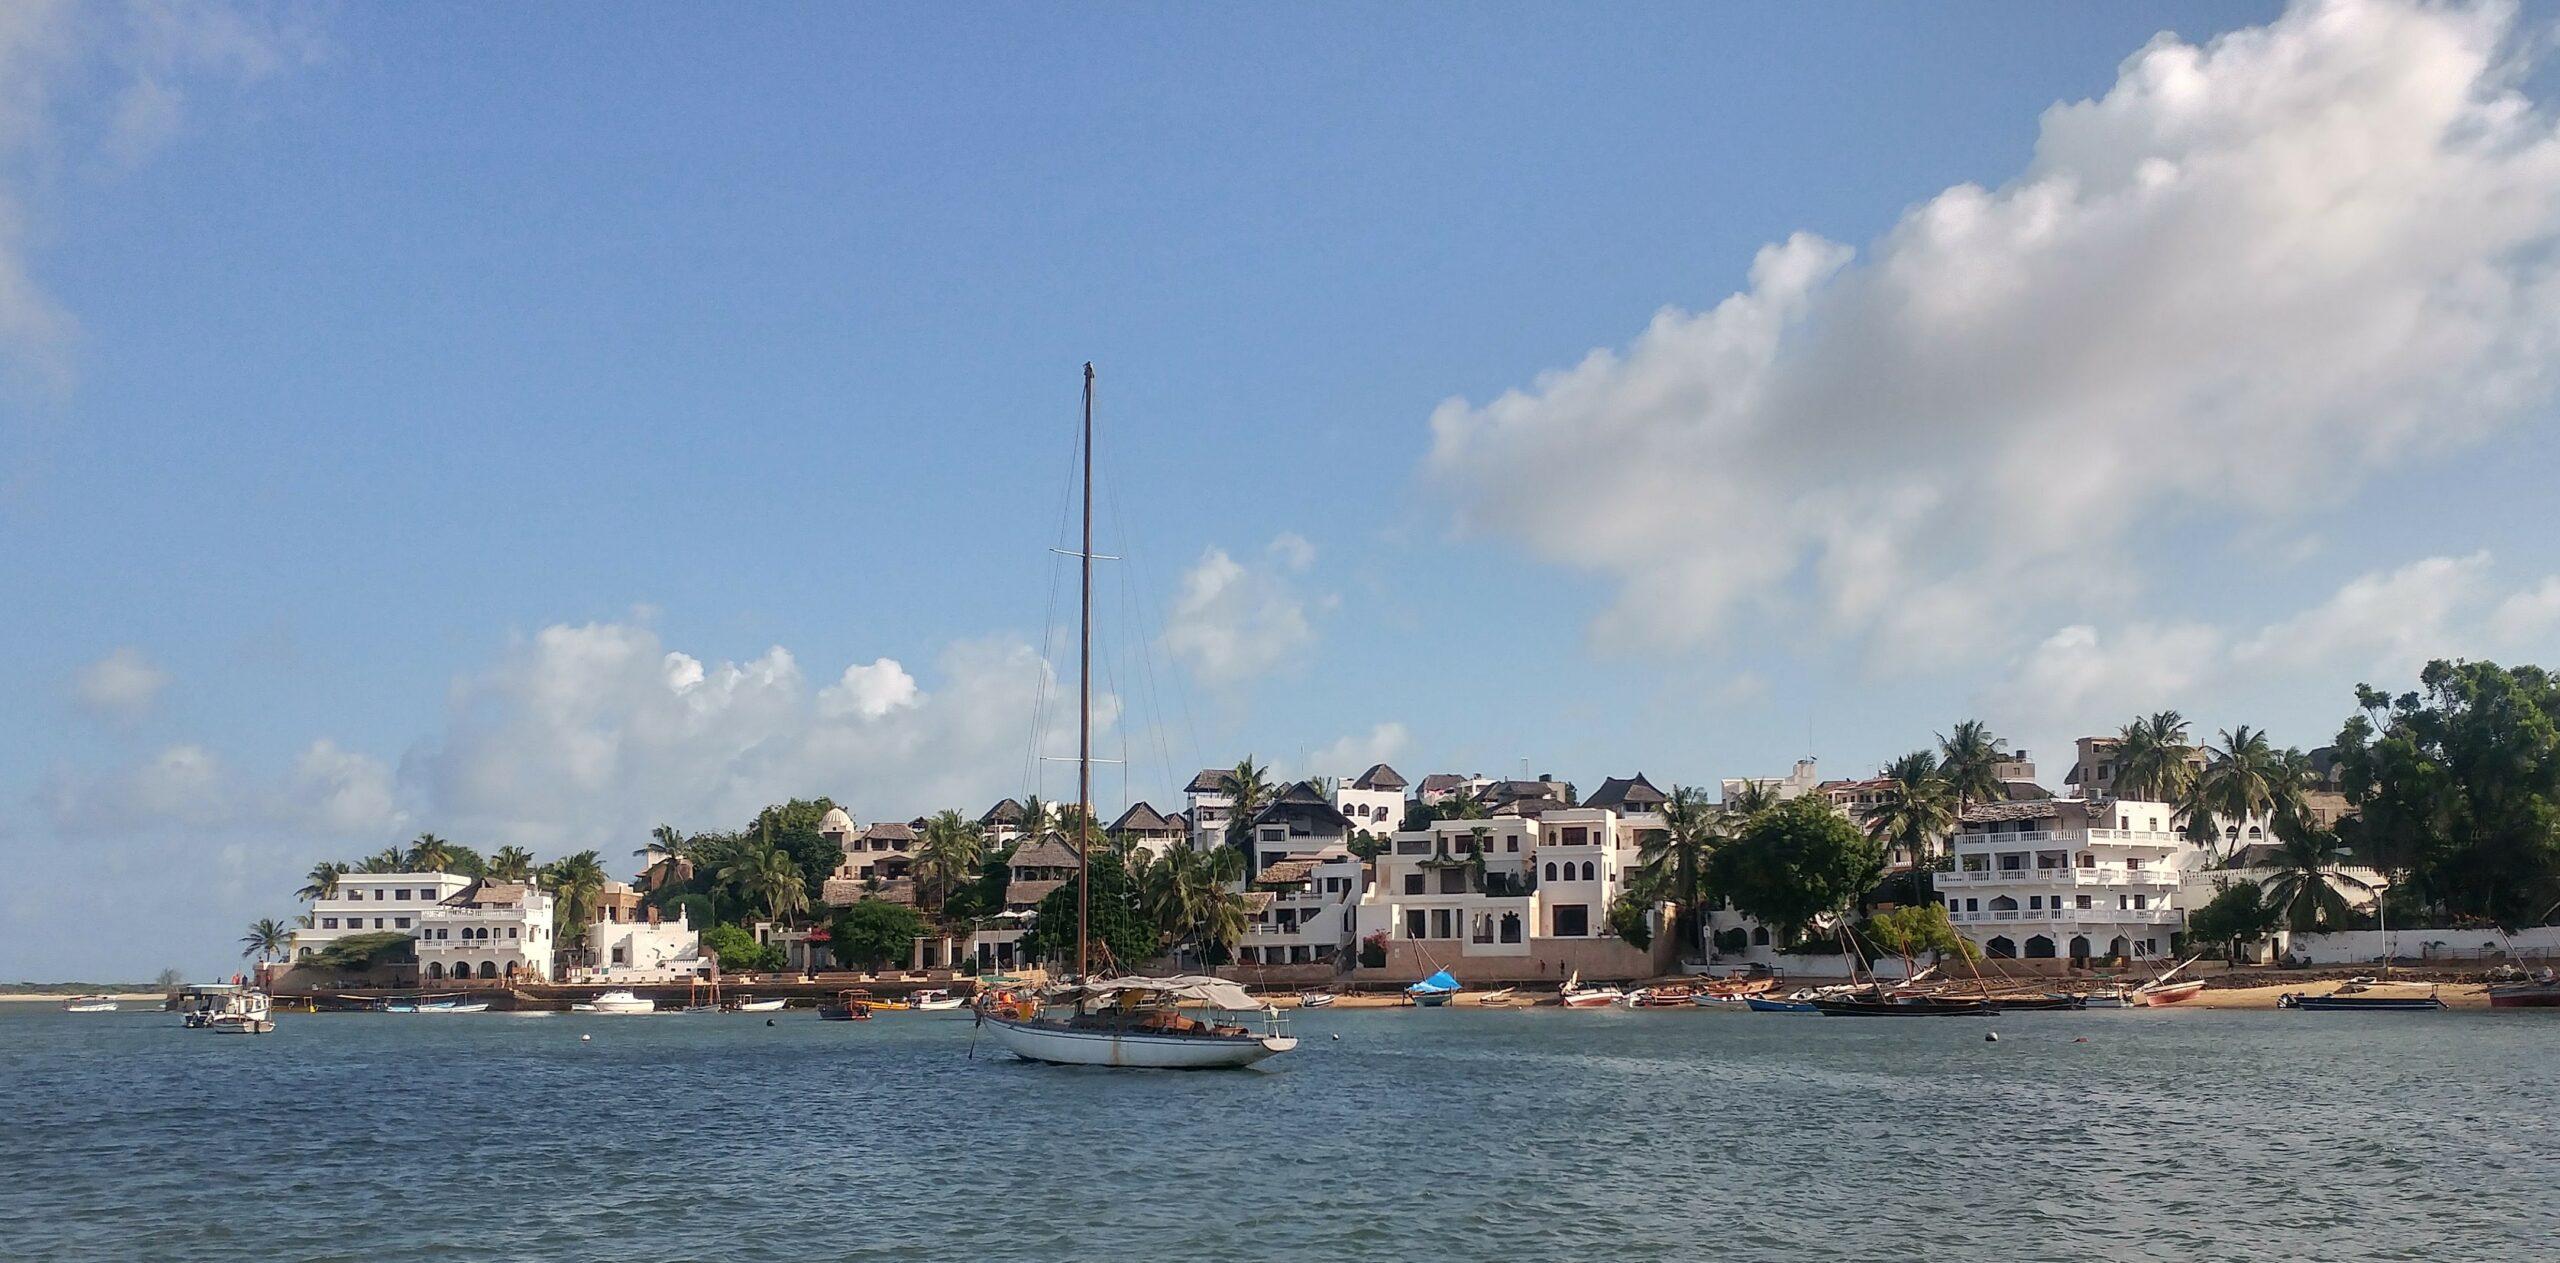 sailboat along the coast of Lamu on Kenya's coast